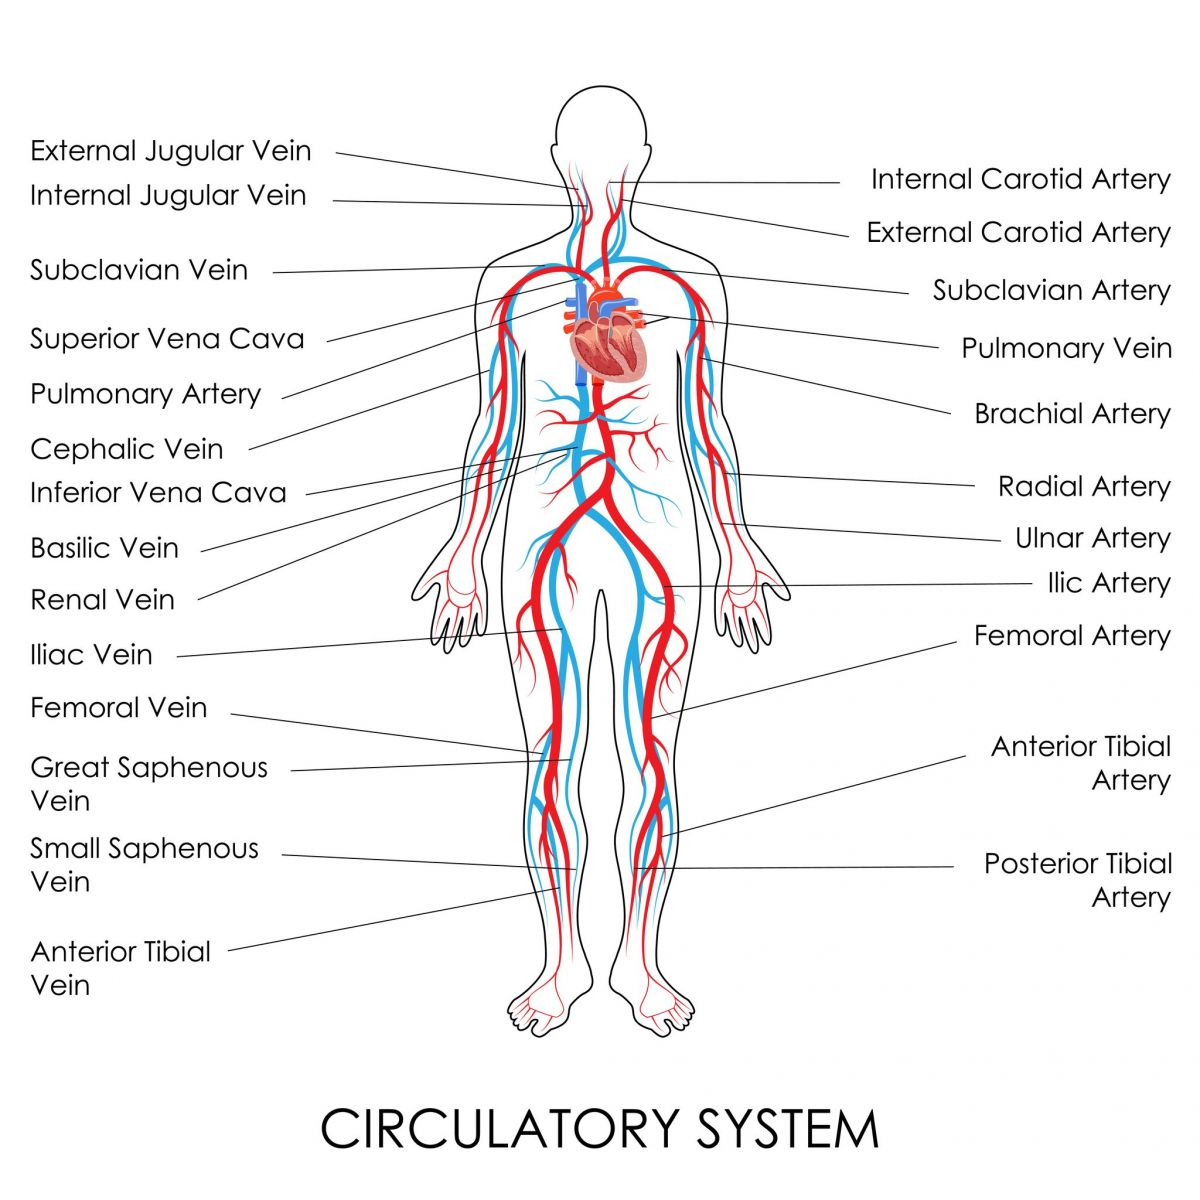 Arteries And Veins Diagram Angiogram Singapore Vascular Imaging Blood Vessels Analysis